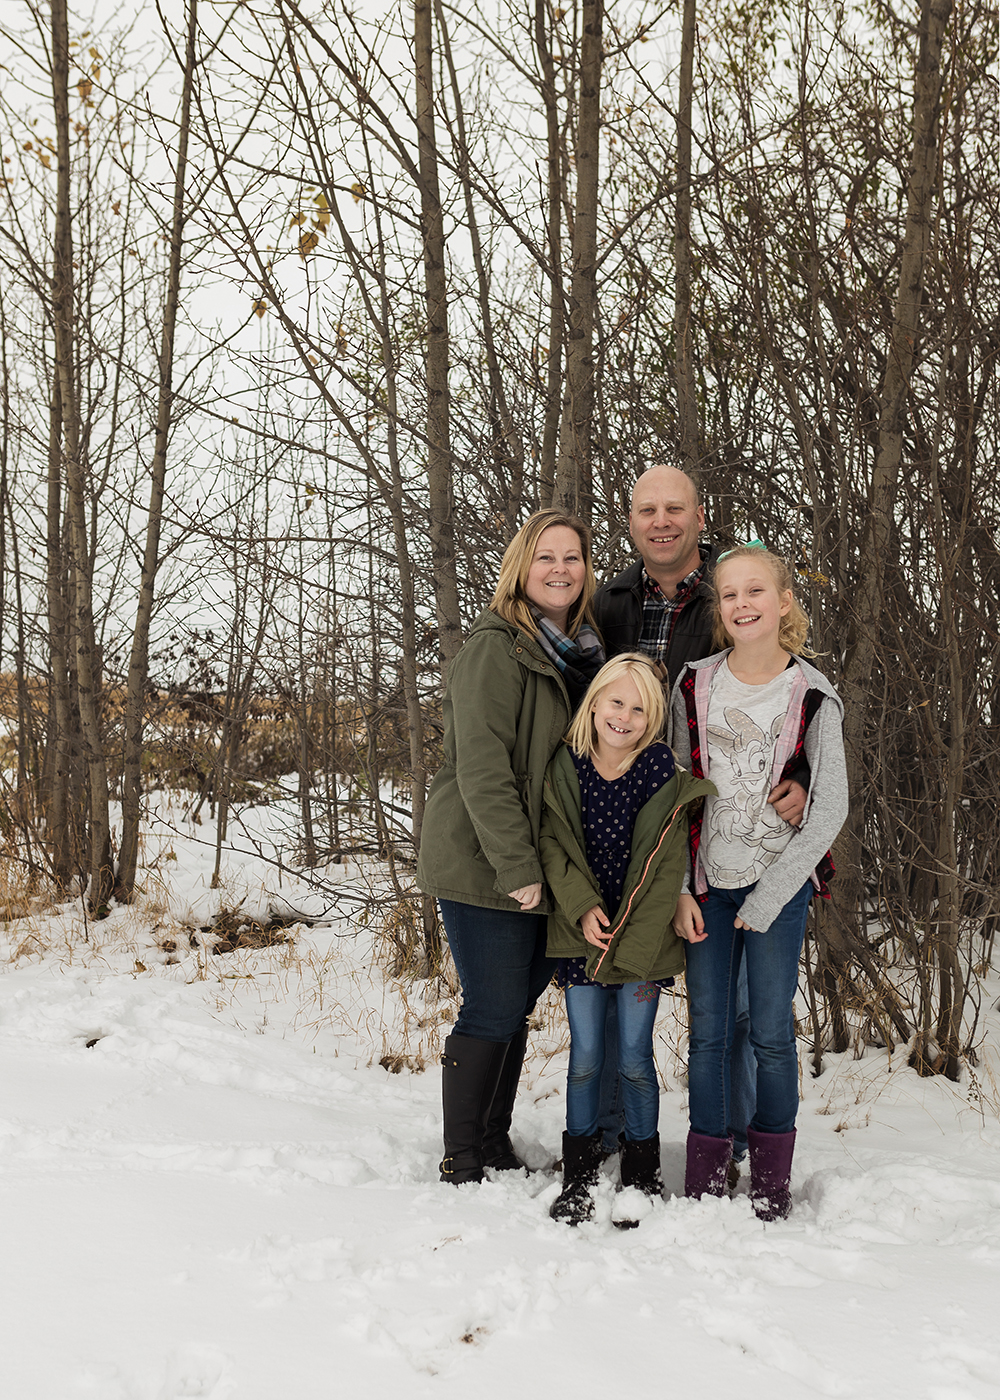 Edmonton Family Photographer_Wiles Sneak Peek 2.jpg